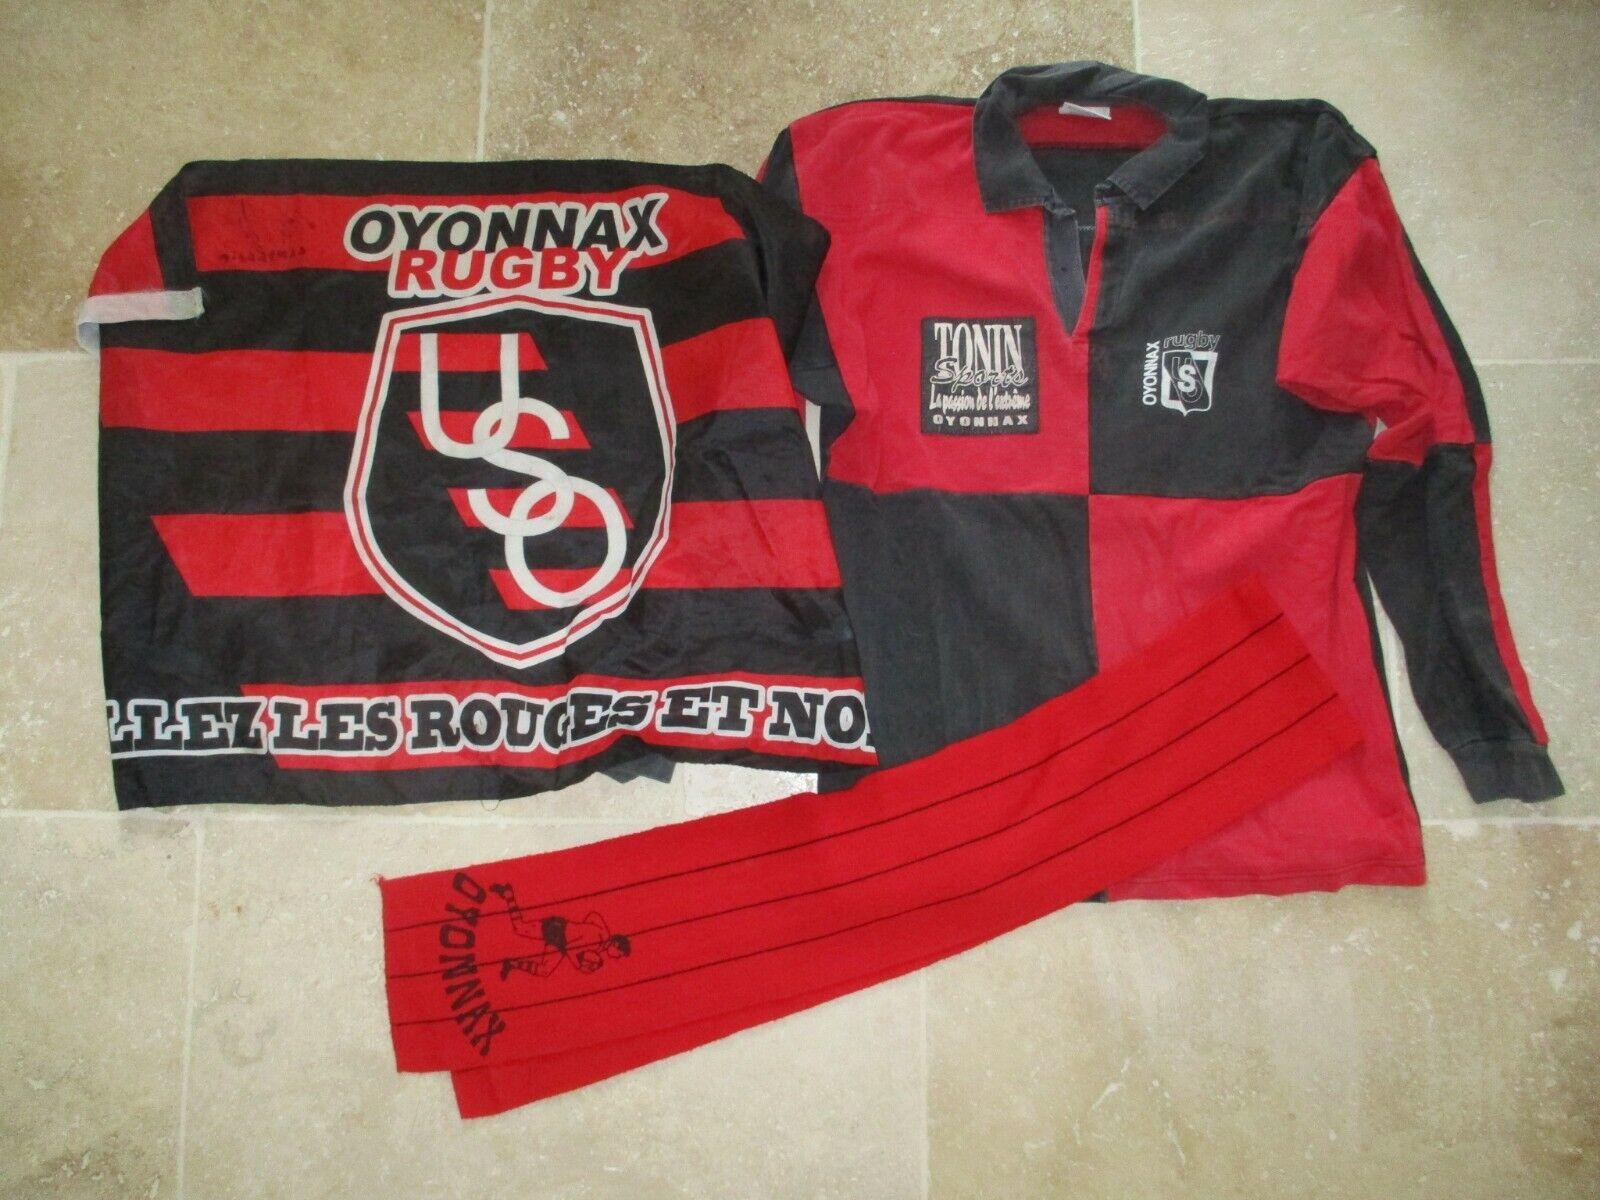 Rugby shirt oxonnax worn nº 22 vintage shirt xl + autographed + flag svoituref